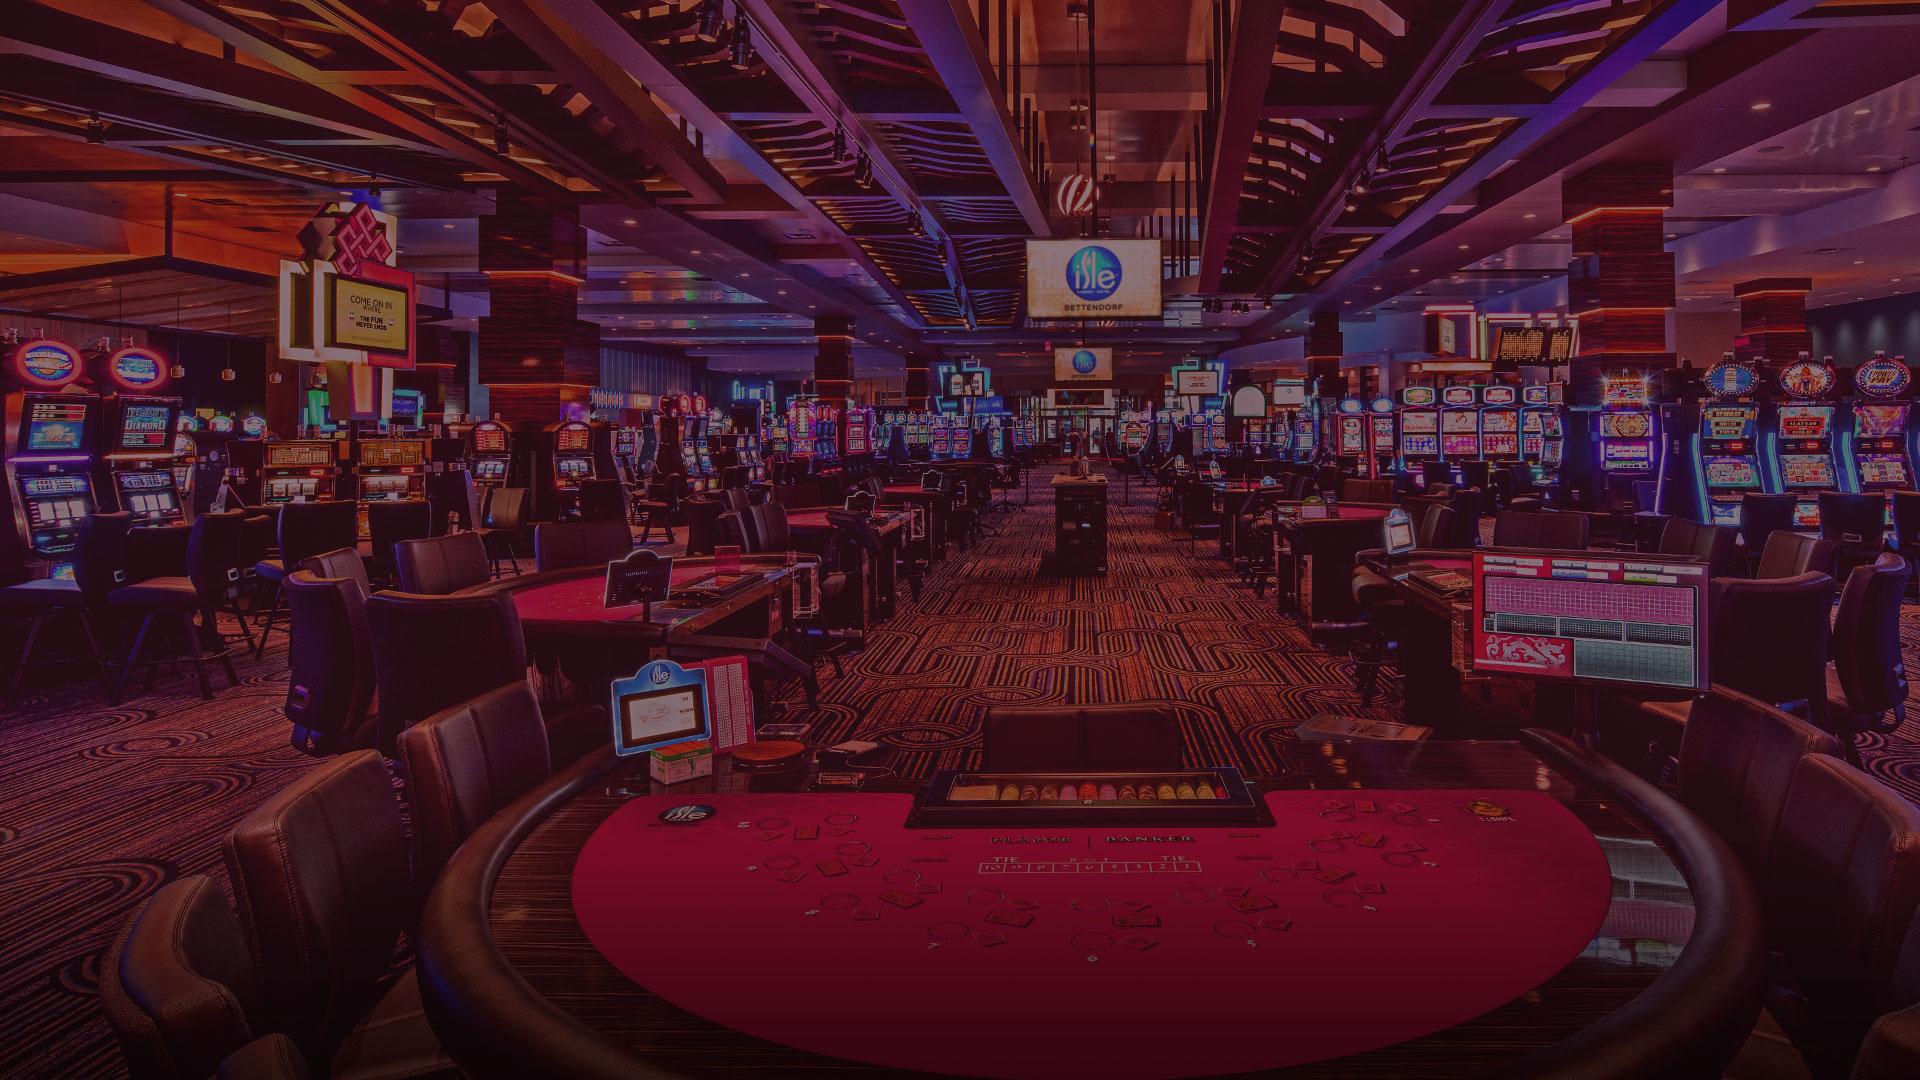 Wi casino locater hardrock casino immokalee